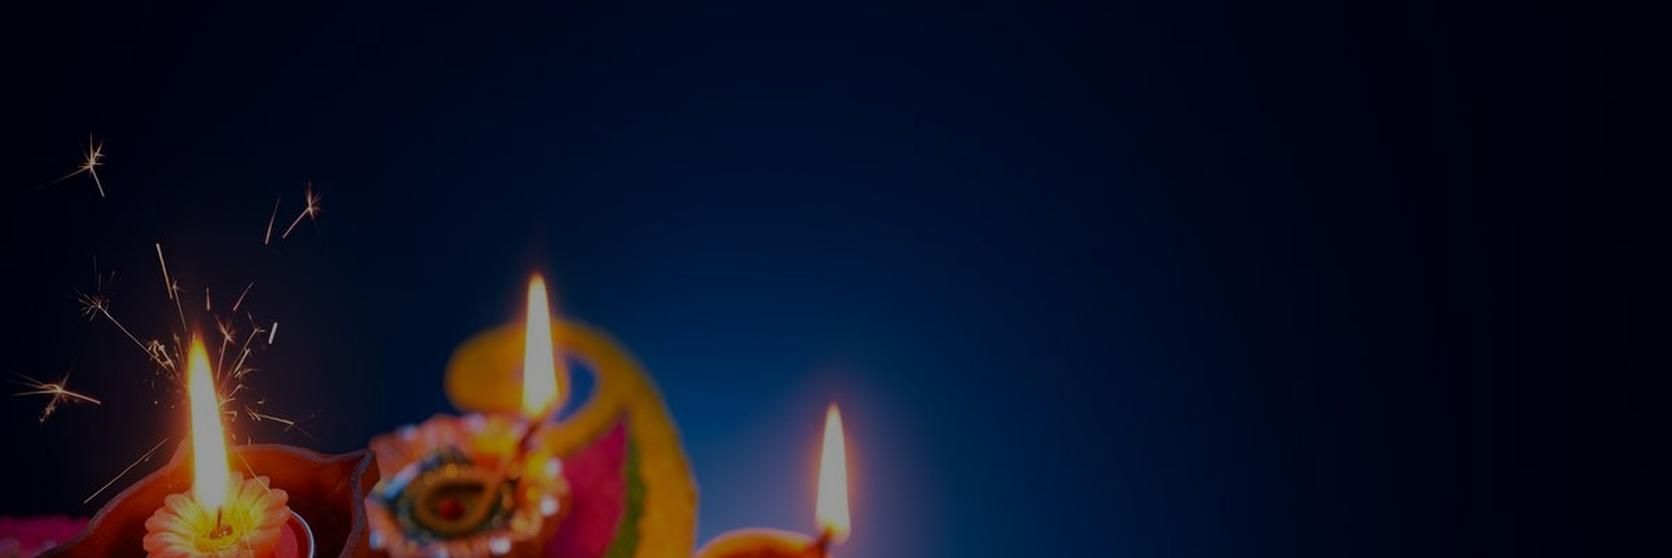 flowers-gifts-diwali-festival-lights-1